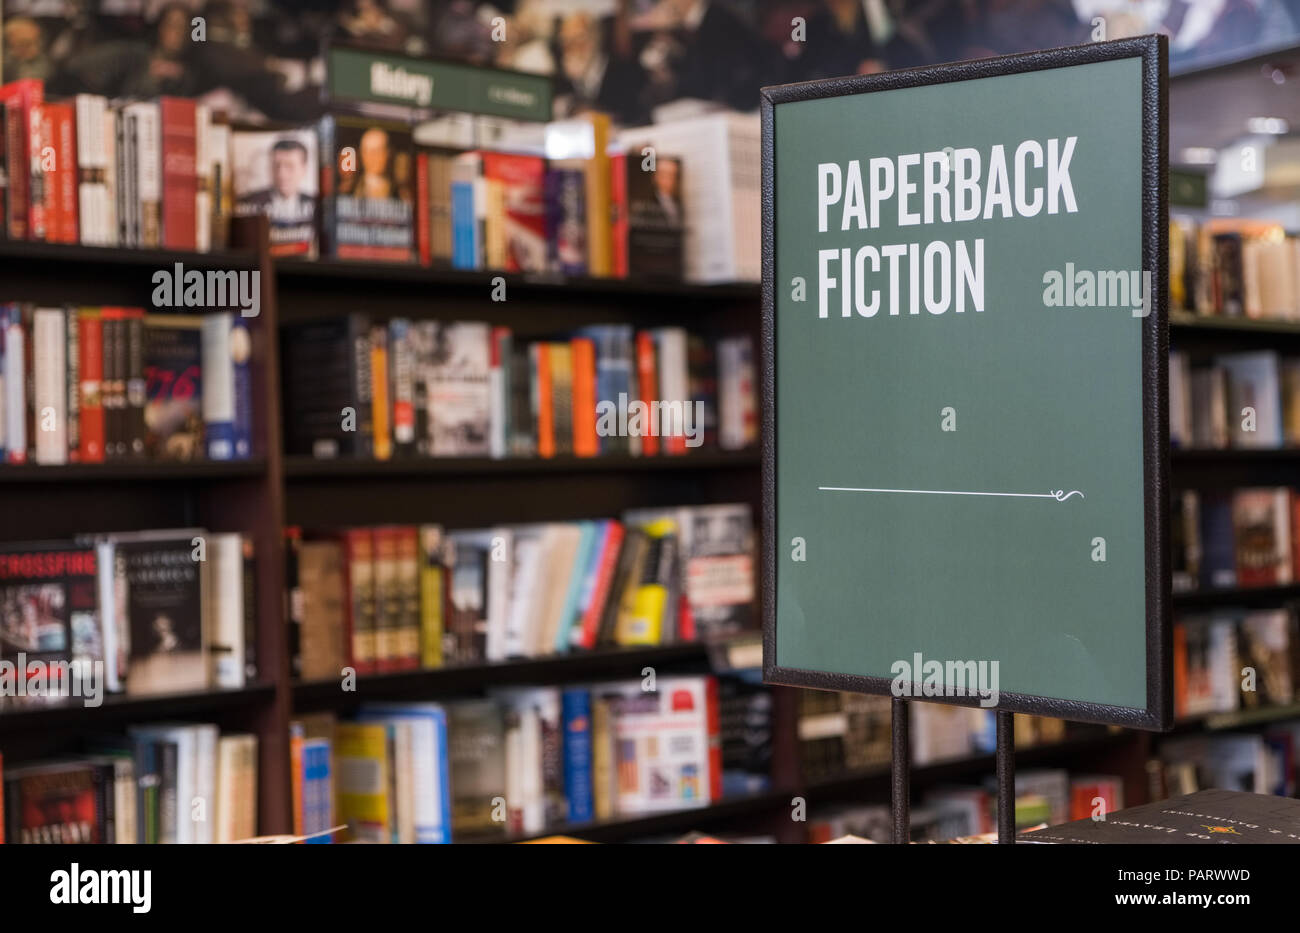 Paperback fiction books sign inside a book shop, UK - Stock Image